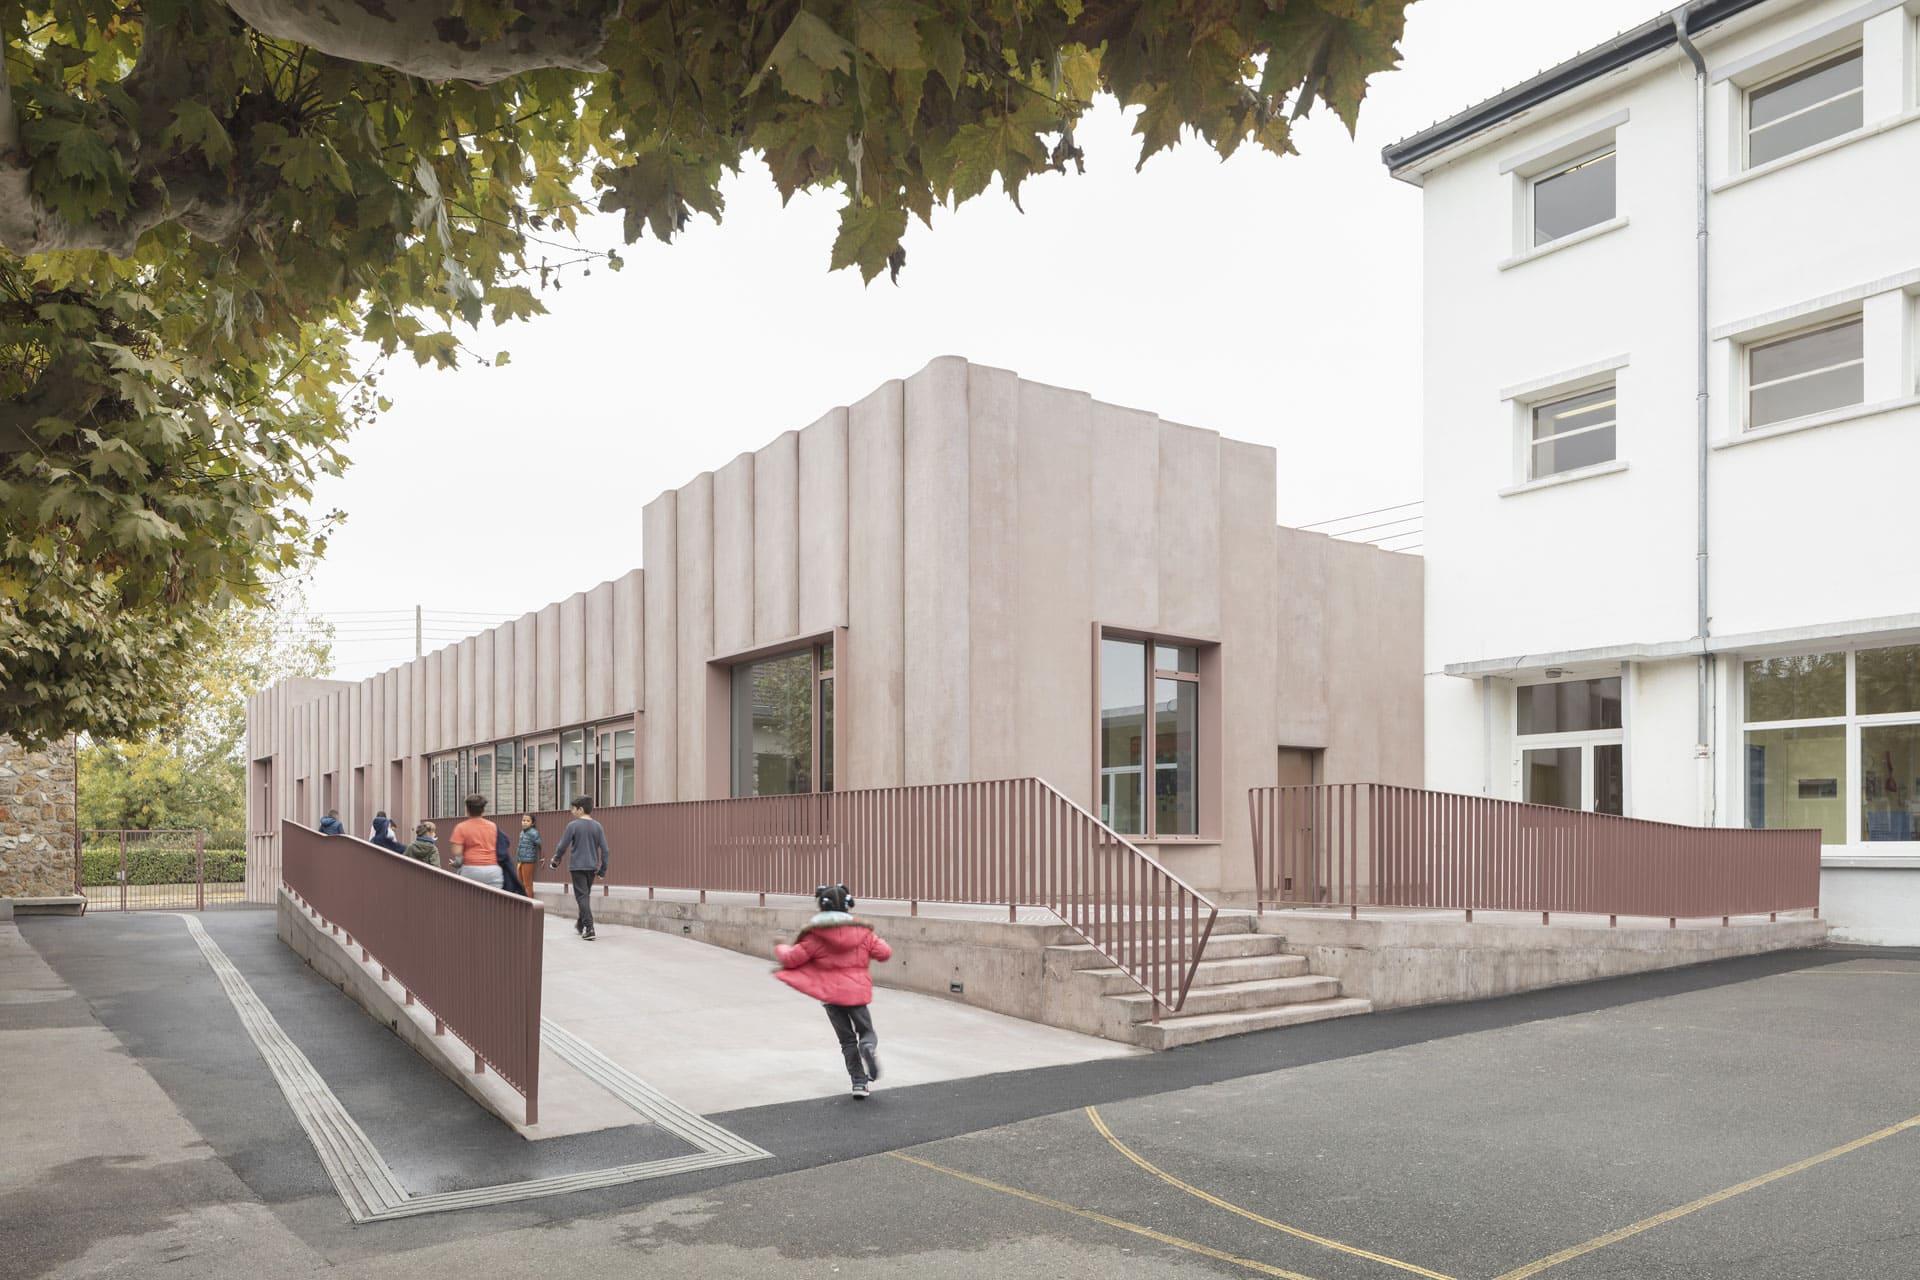 Jaurès recreation center by Graal